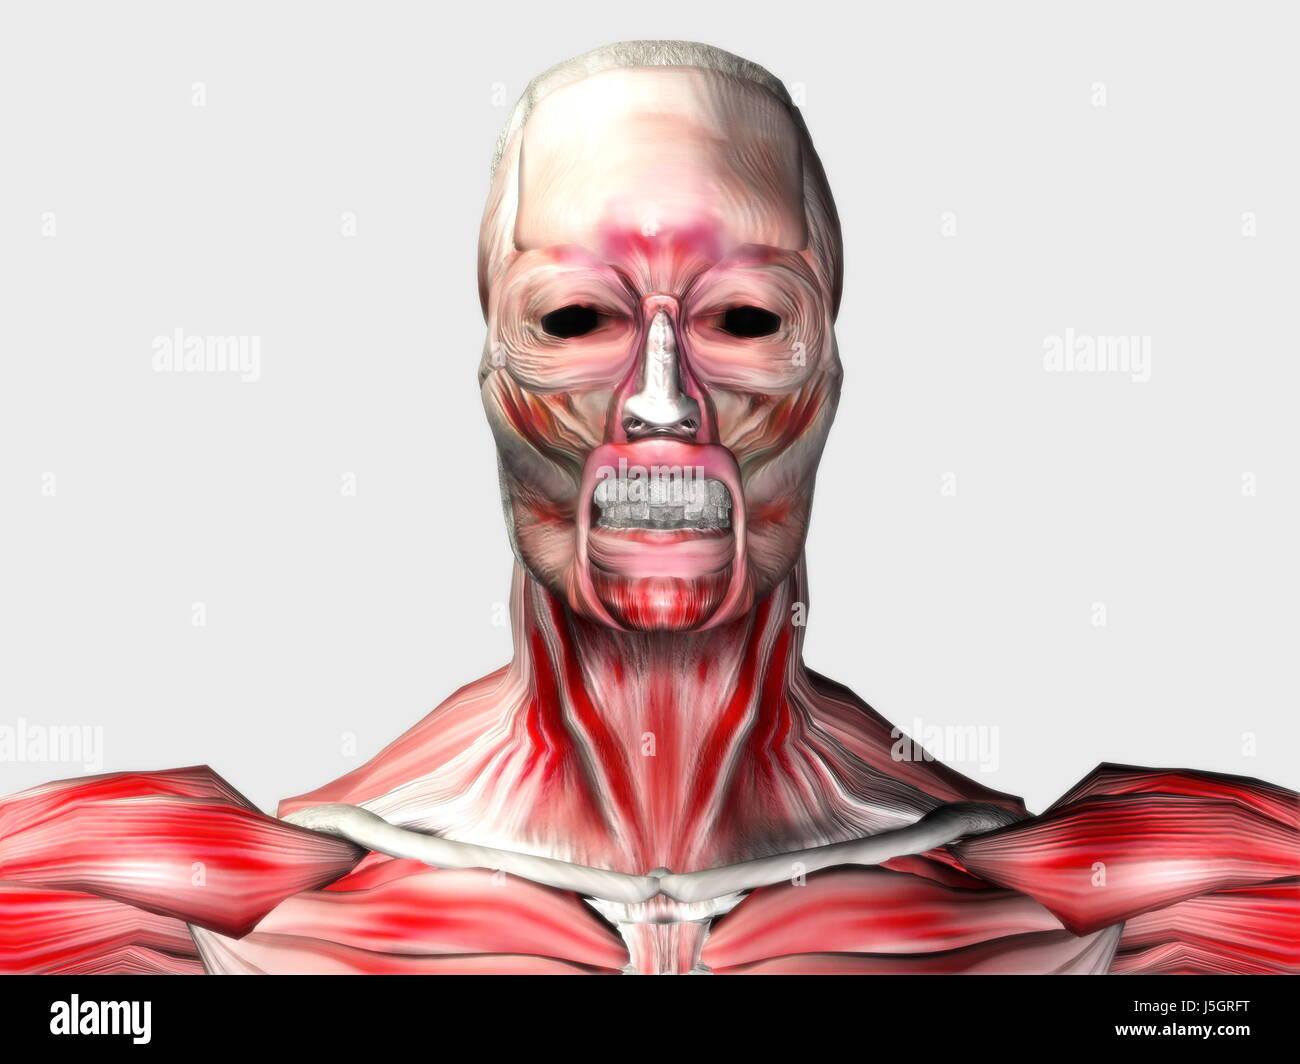 sport sports teeth pine face skin eyes muscles fantasy look glancing ...